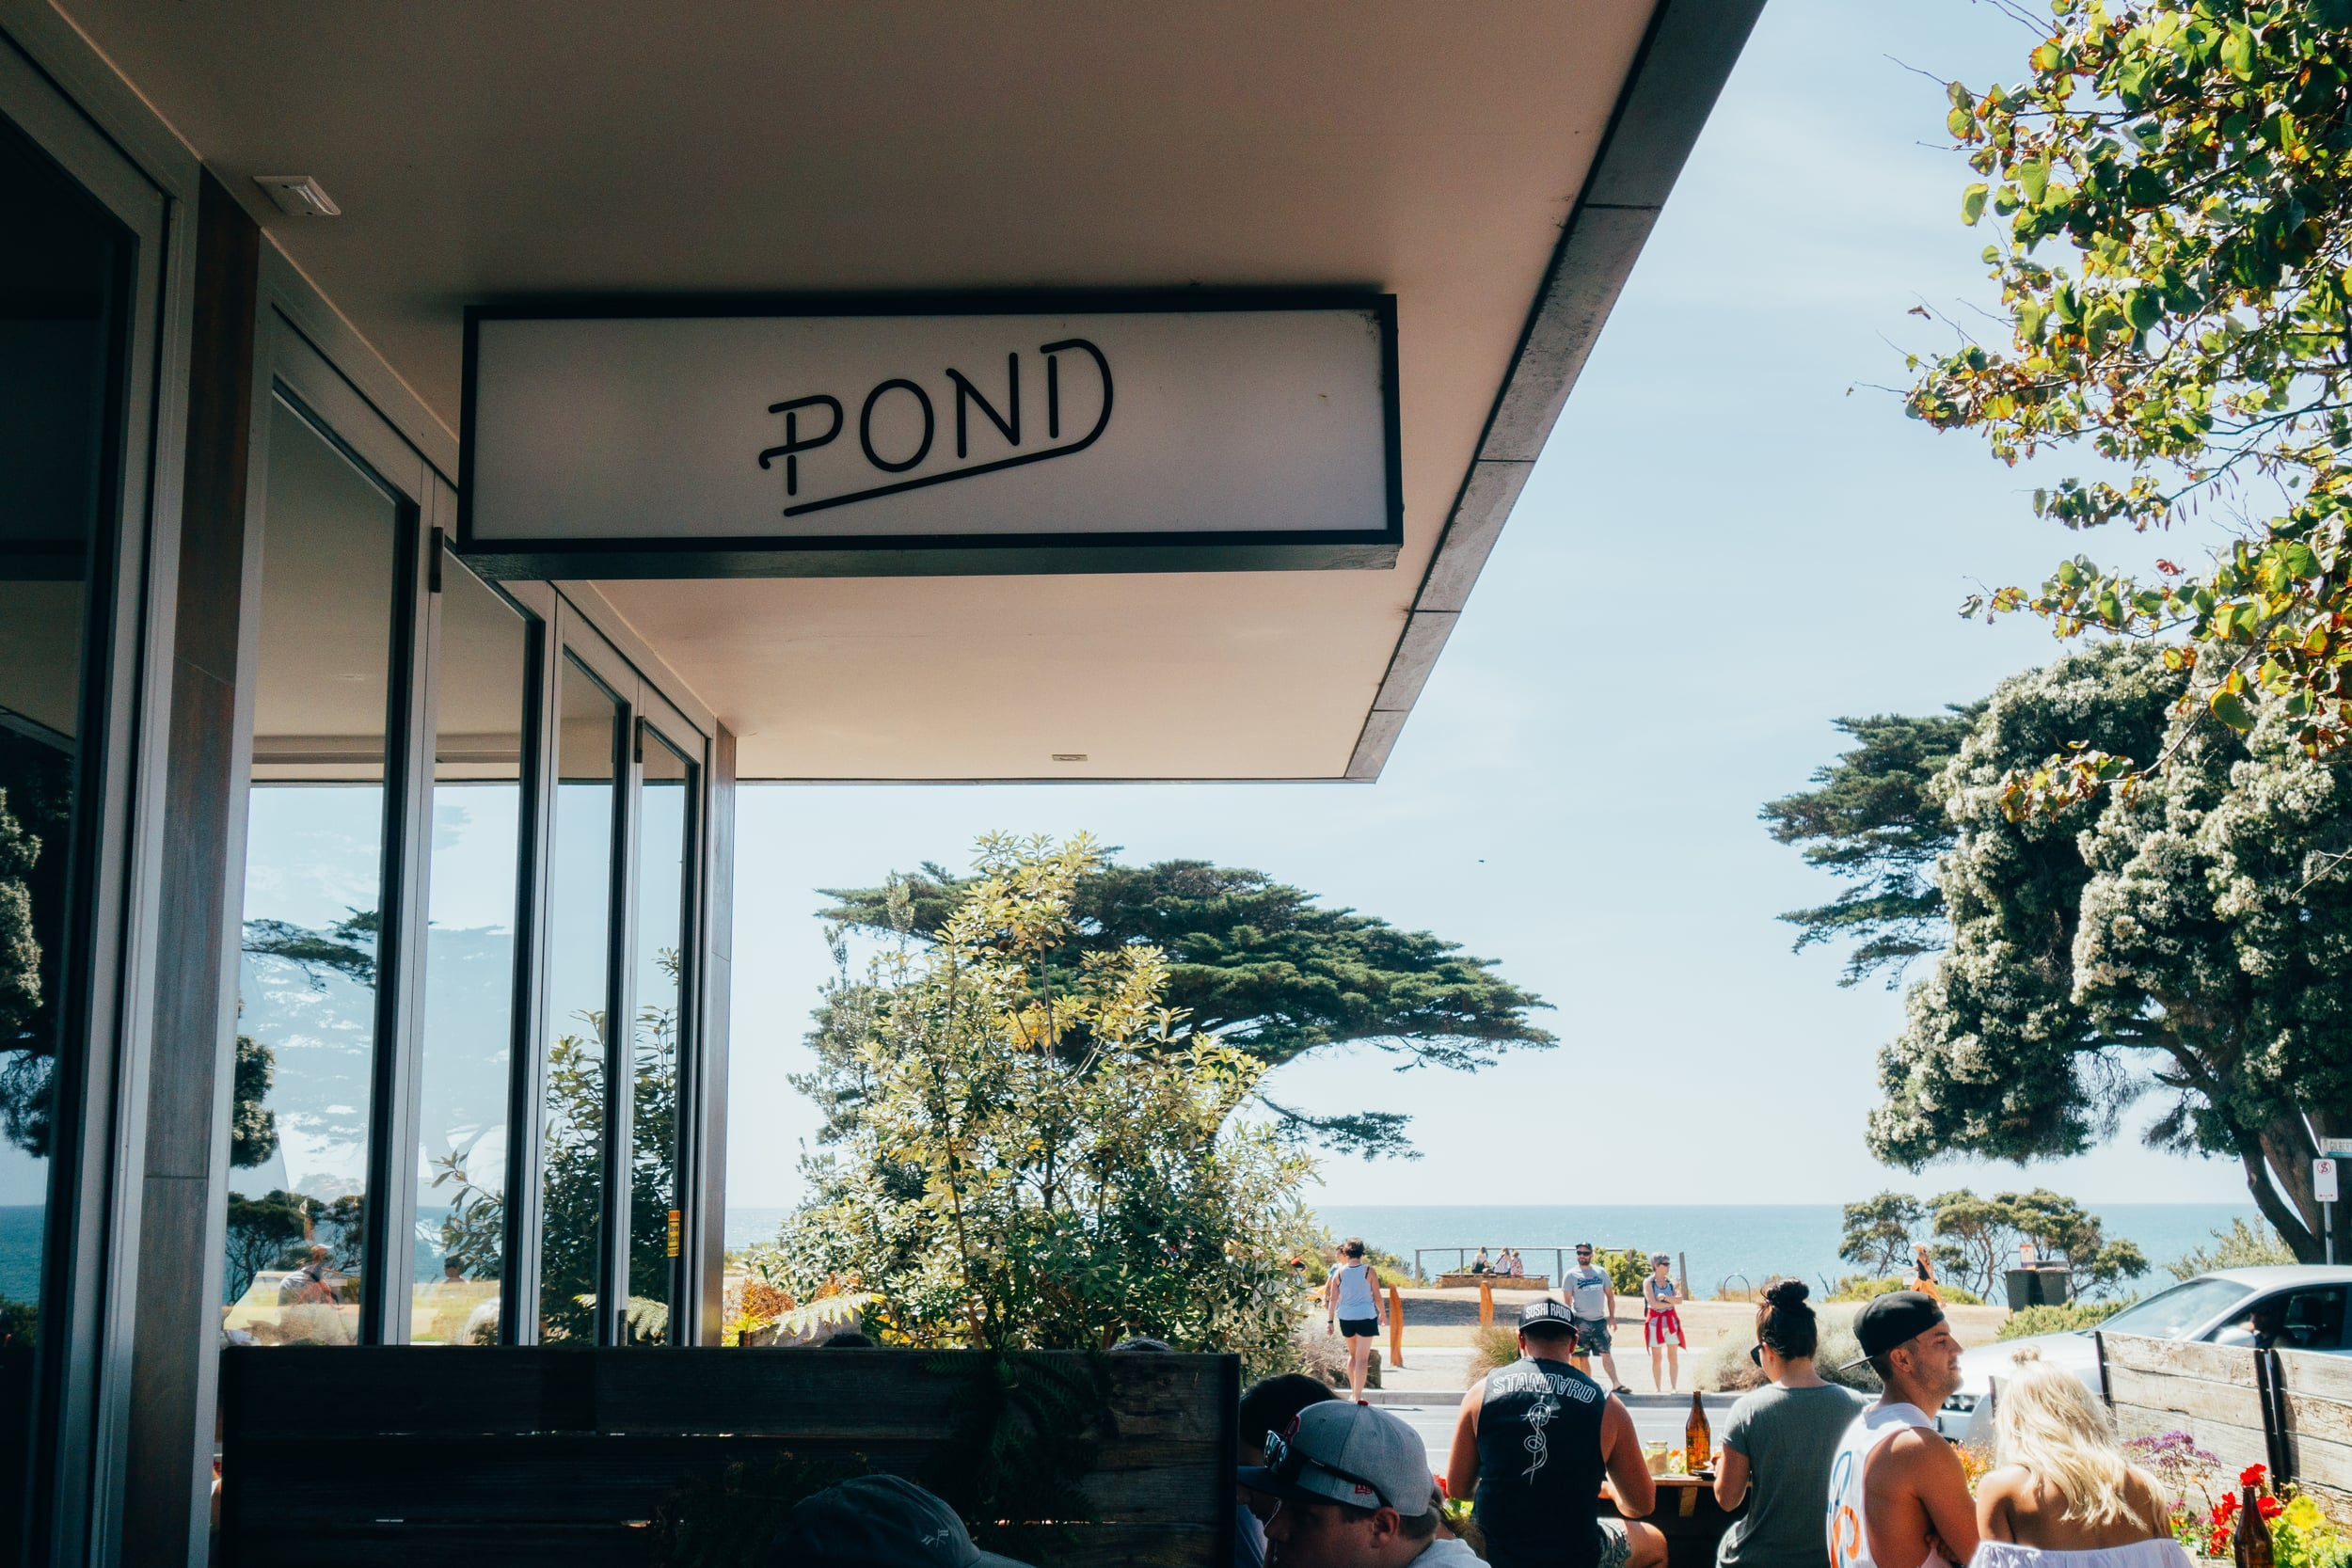 pond torquay sign